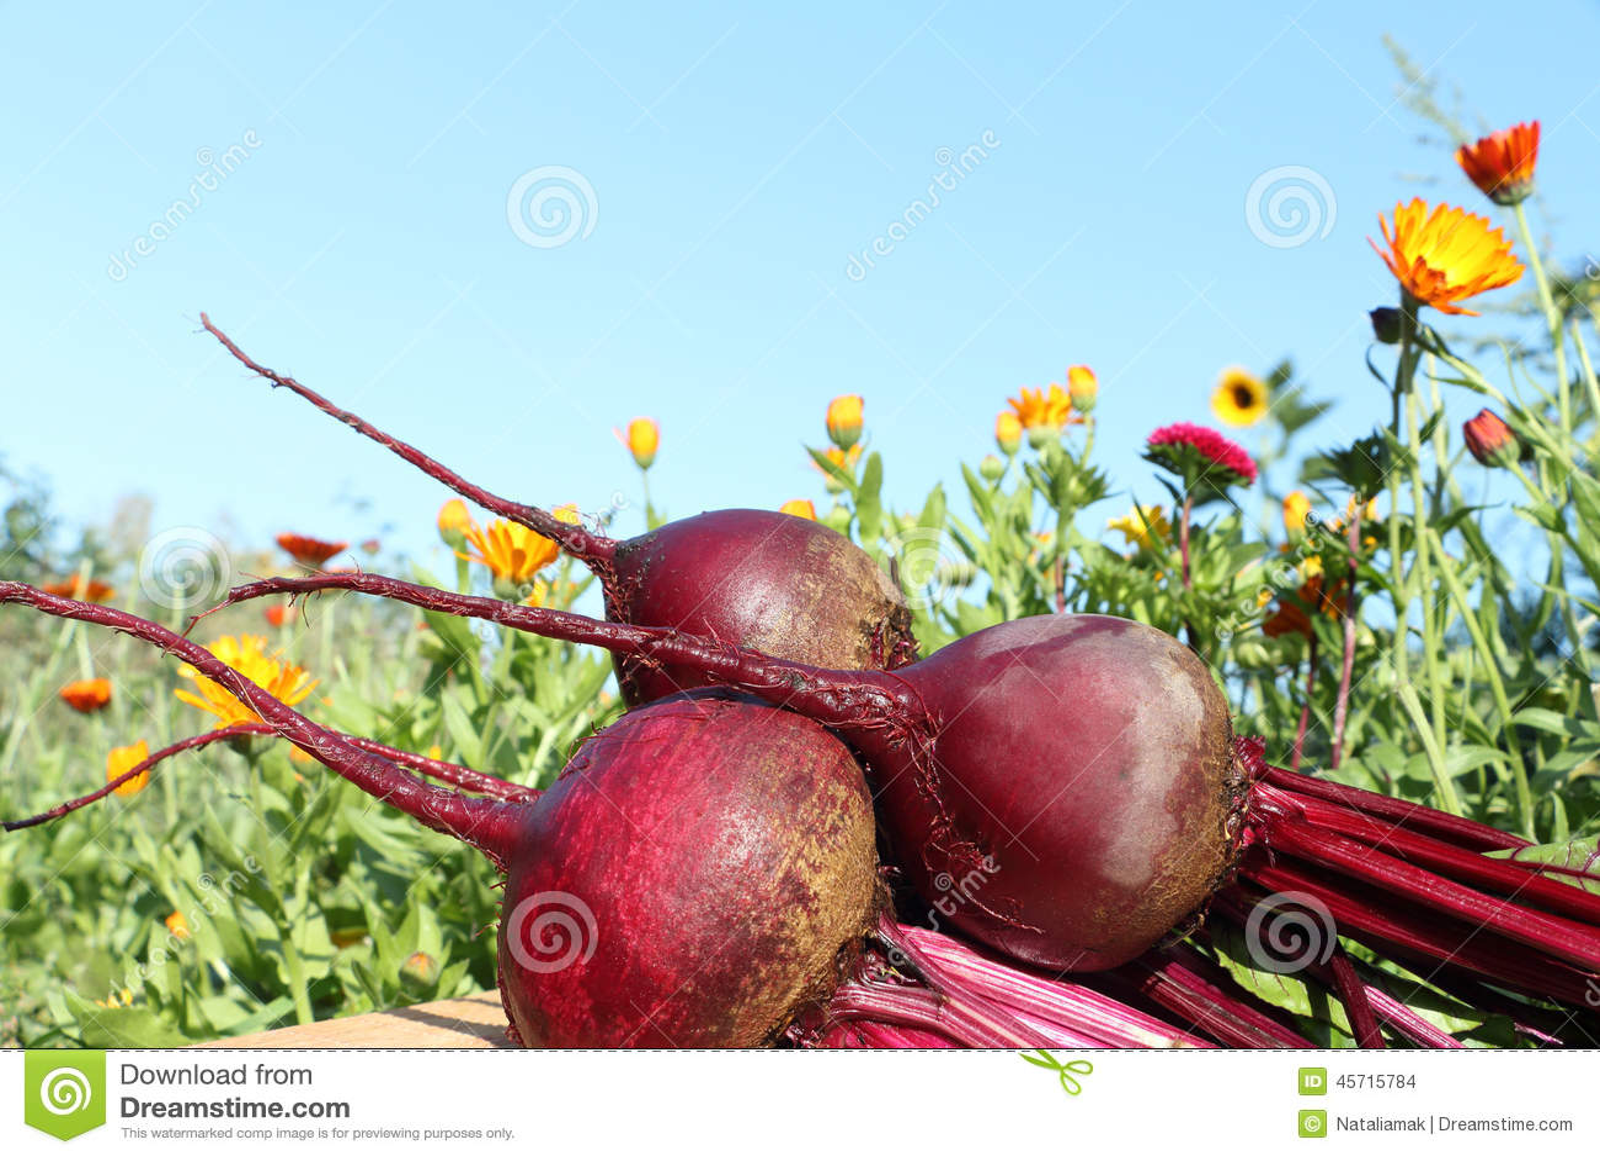 Beets Stock Photo Image 45715784